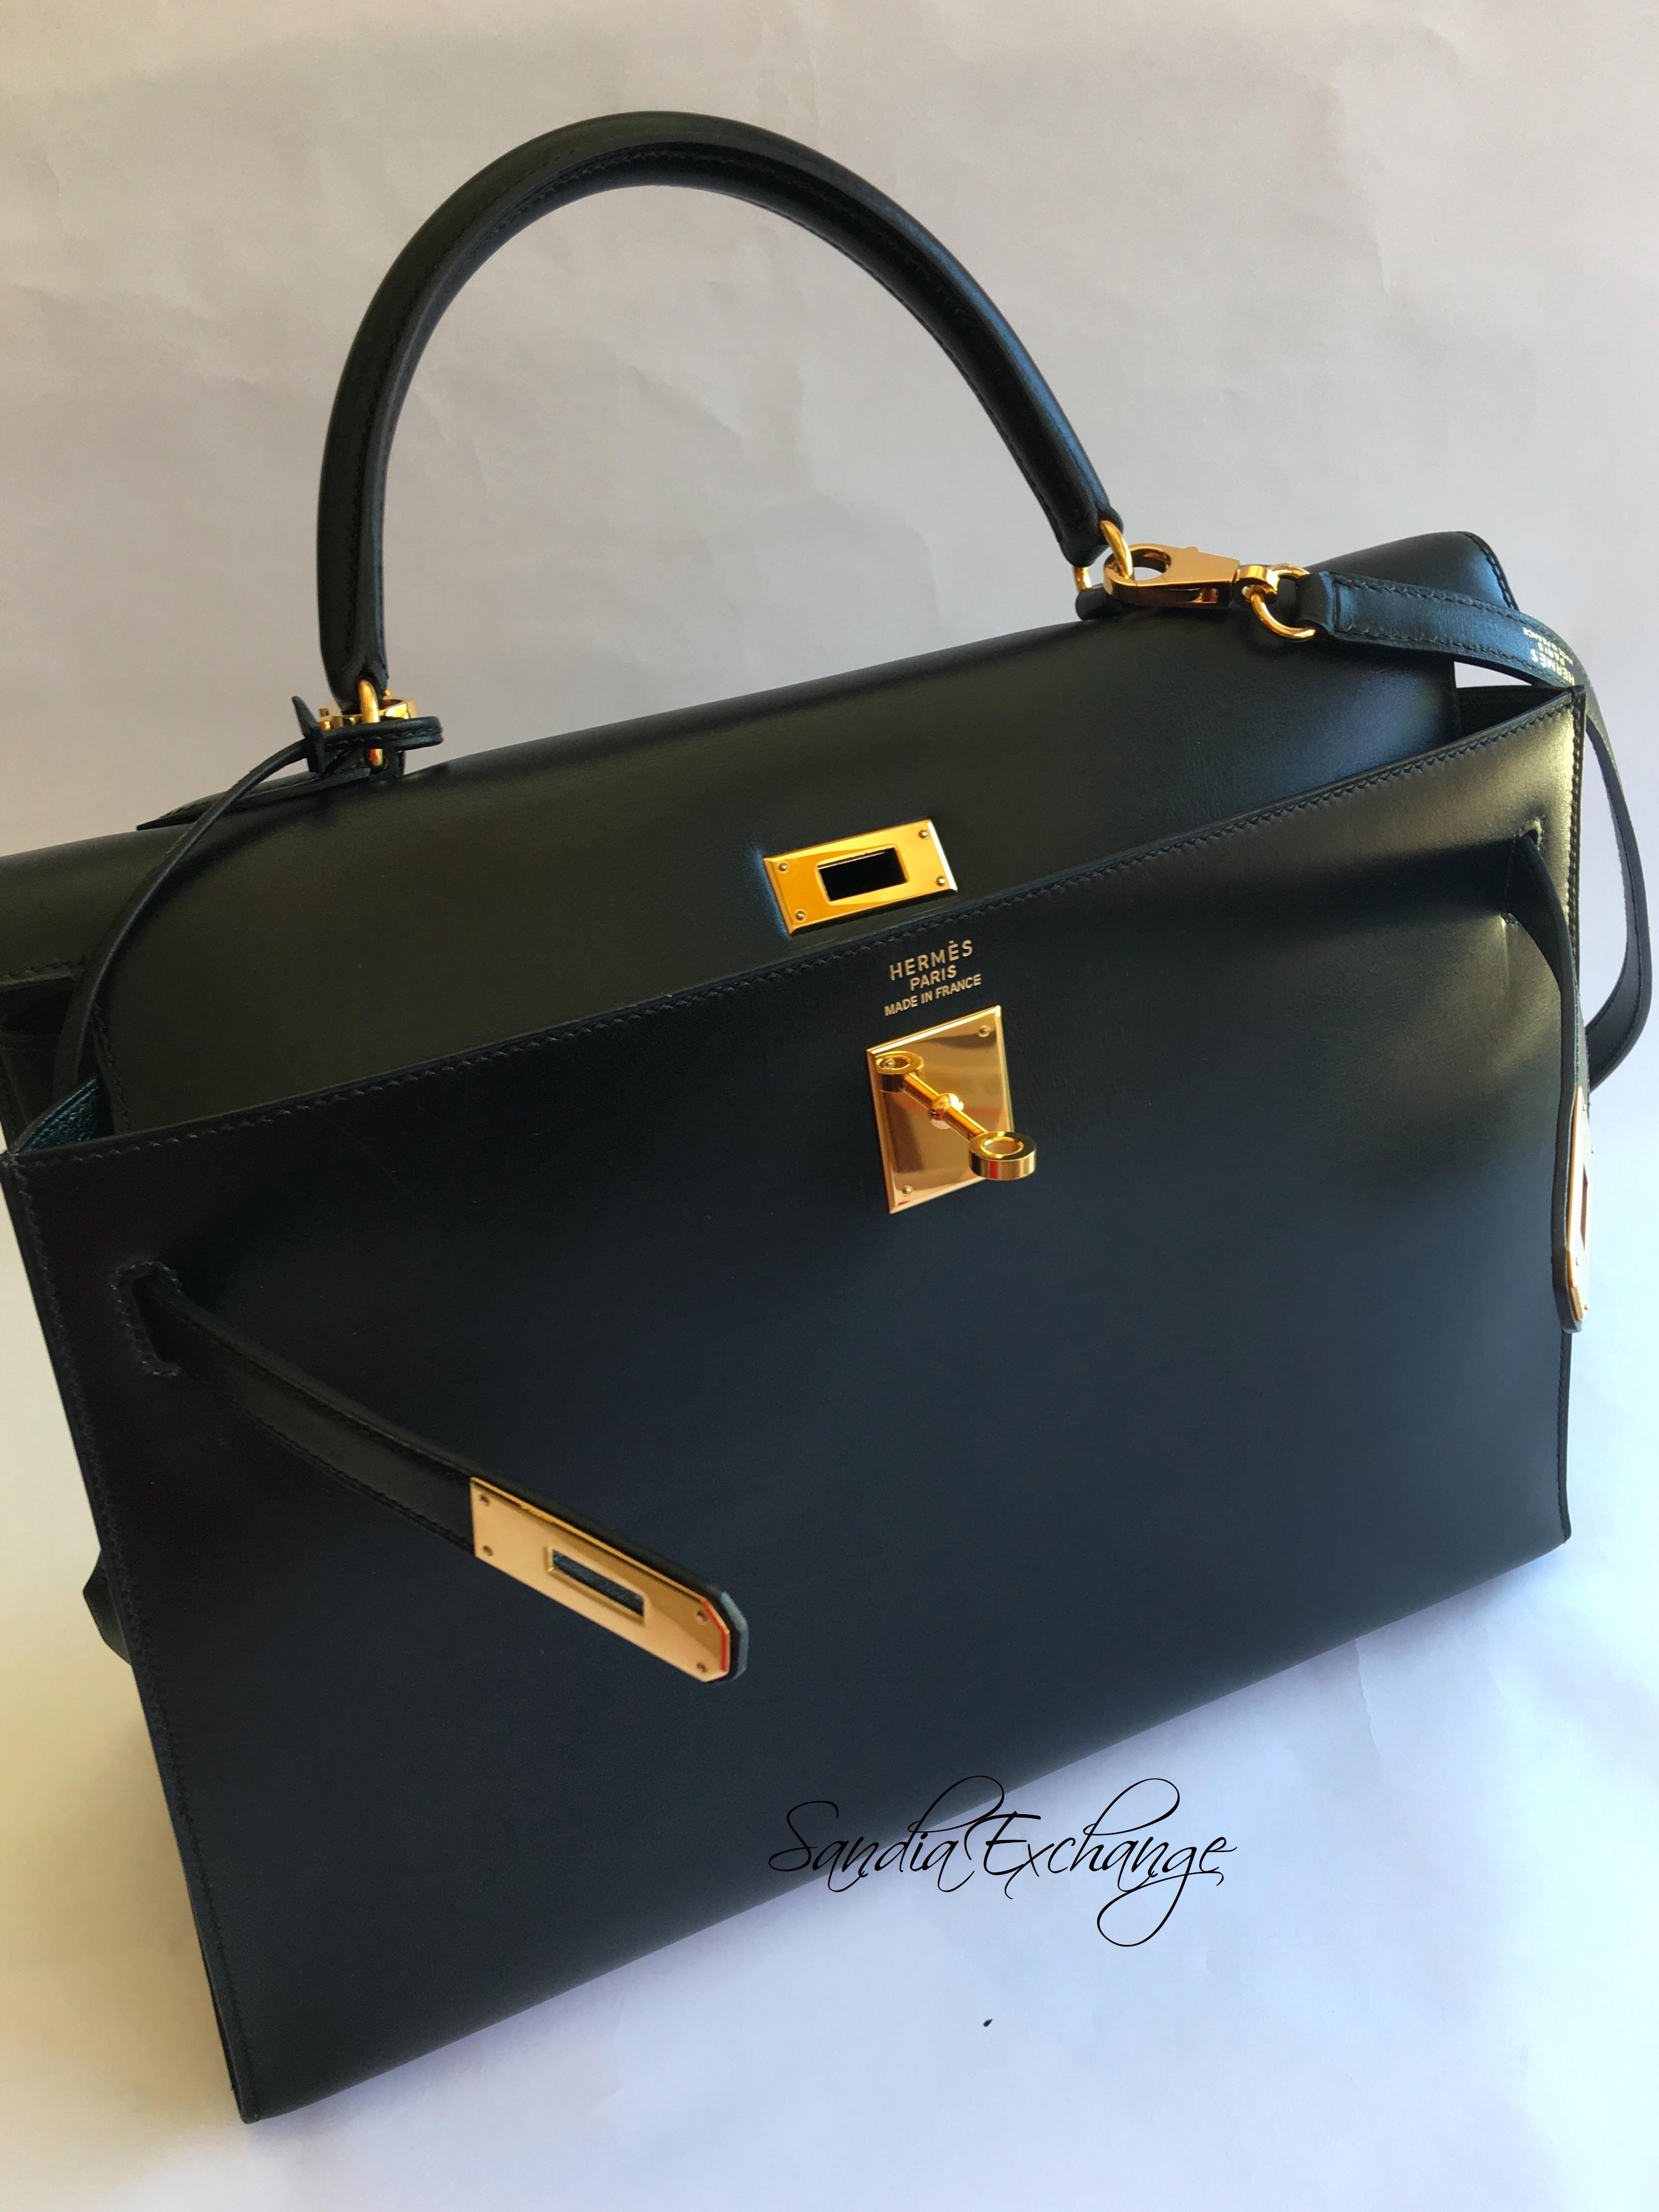 23b4ea6f90d2 Hermes Kelly 35 cm Black Box Sellier Gold Hardware Authentic Hermès ...